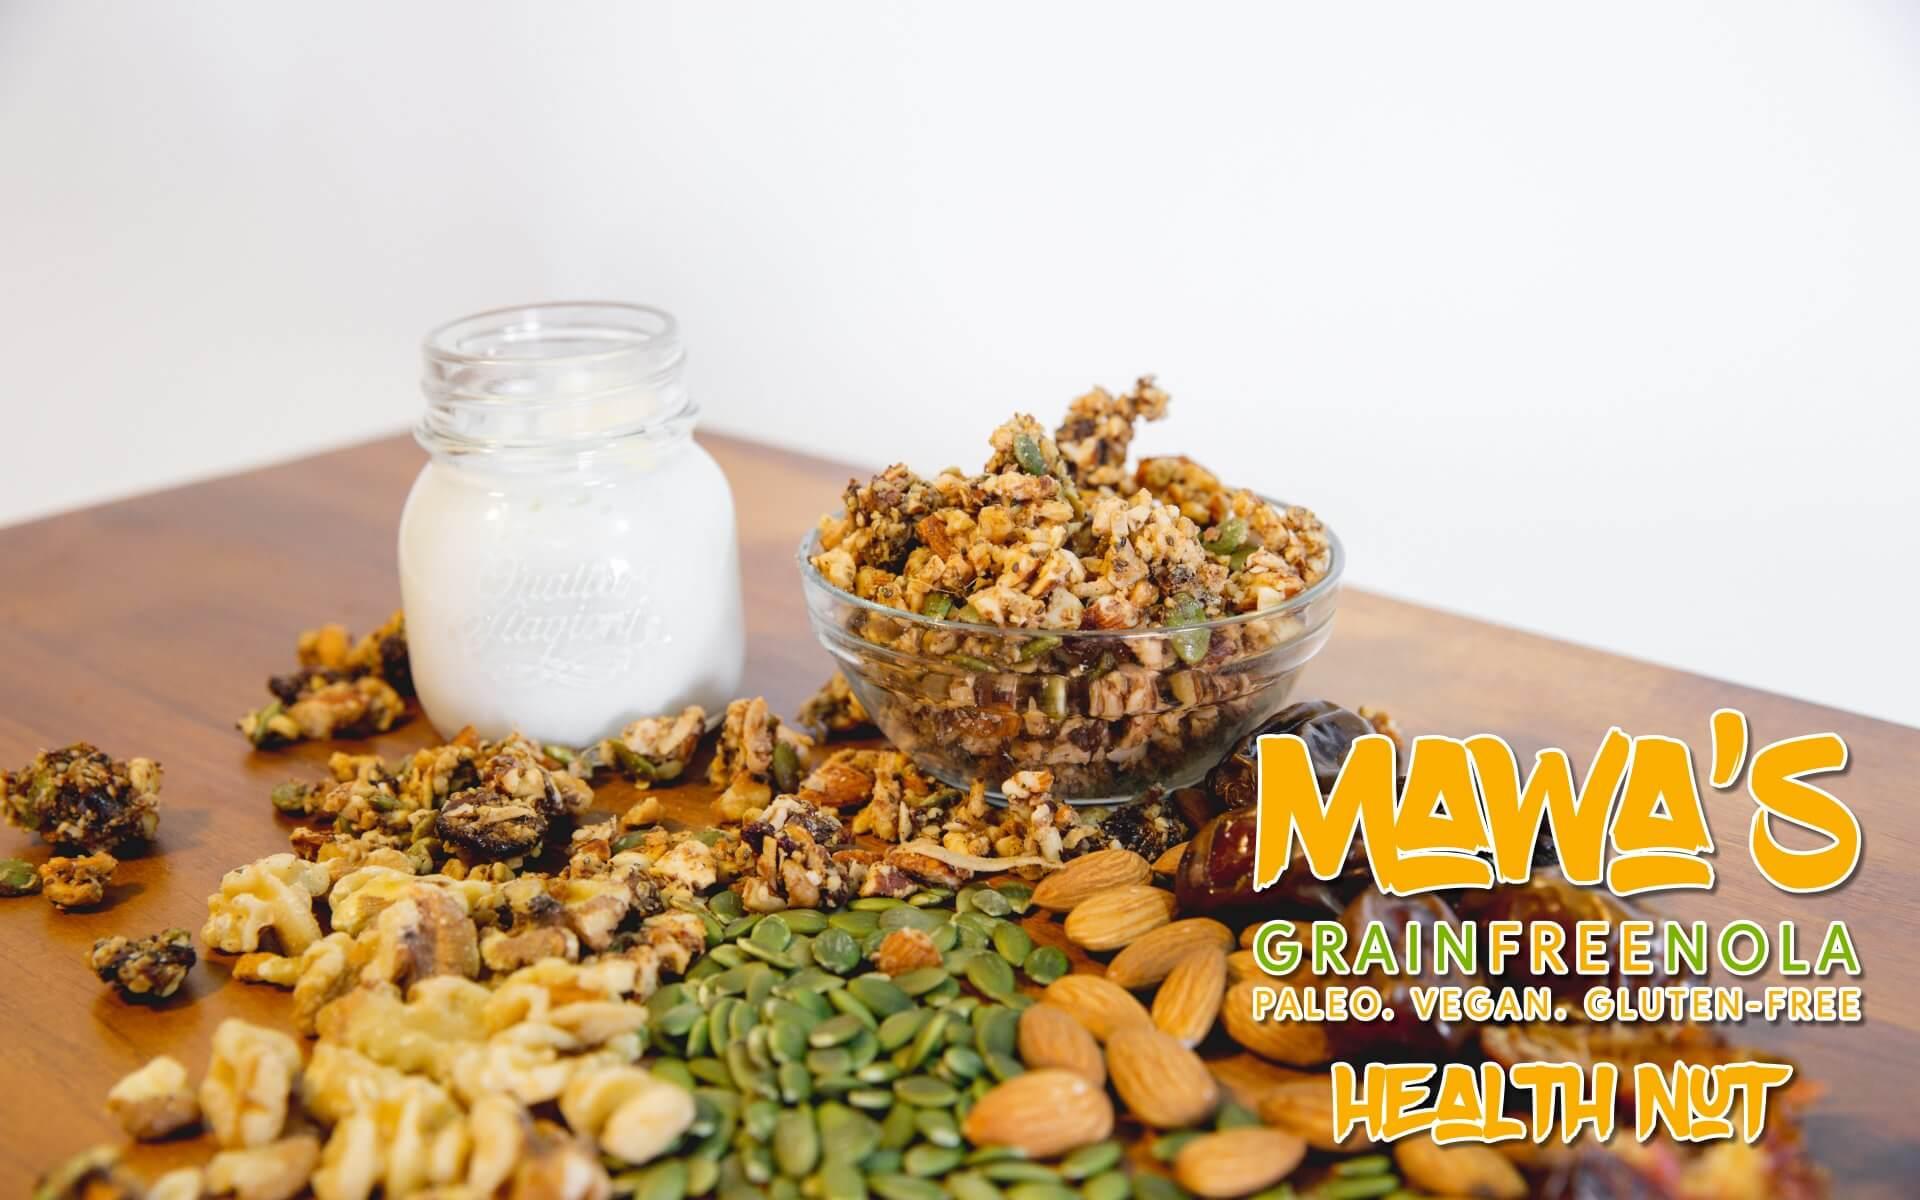 Mawa's GrainFreeNola - Health Nut Paleo, Vegan, Gluten-Free Granola